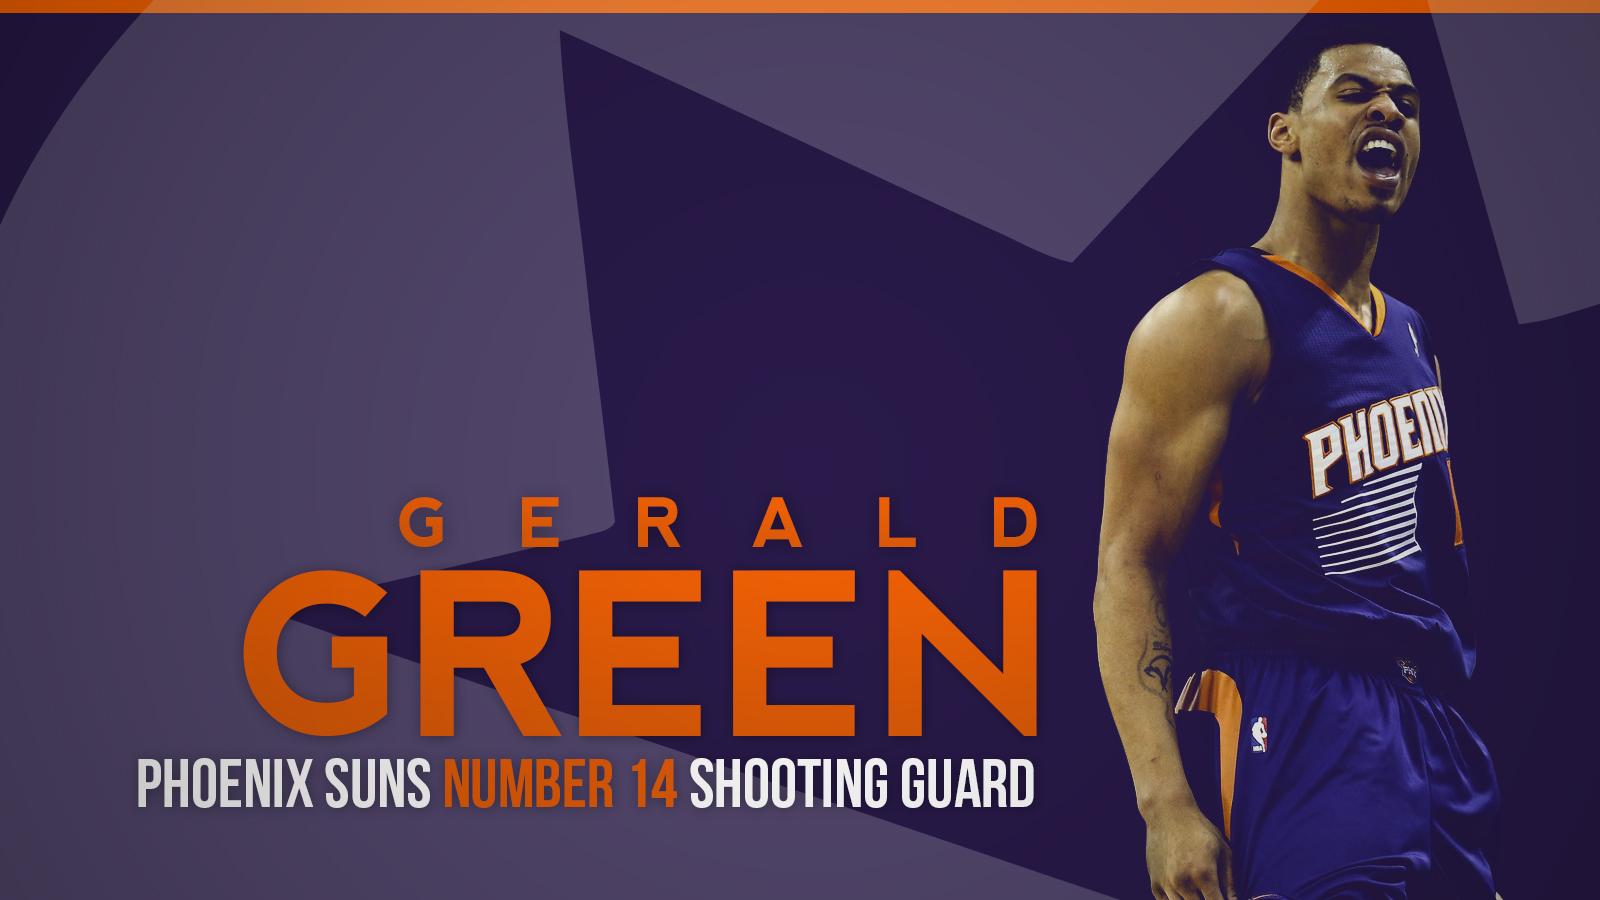 Gallery For > Gerald Green Wallpaper Suns